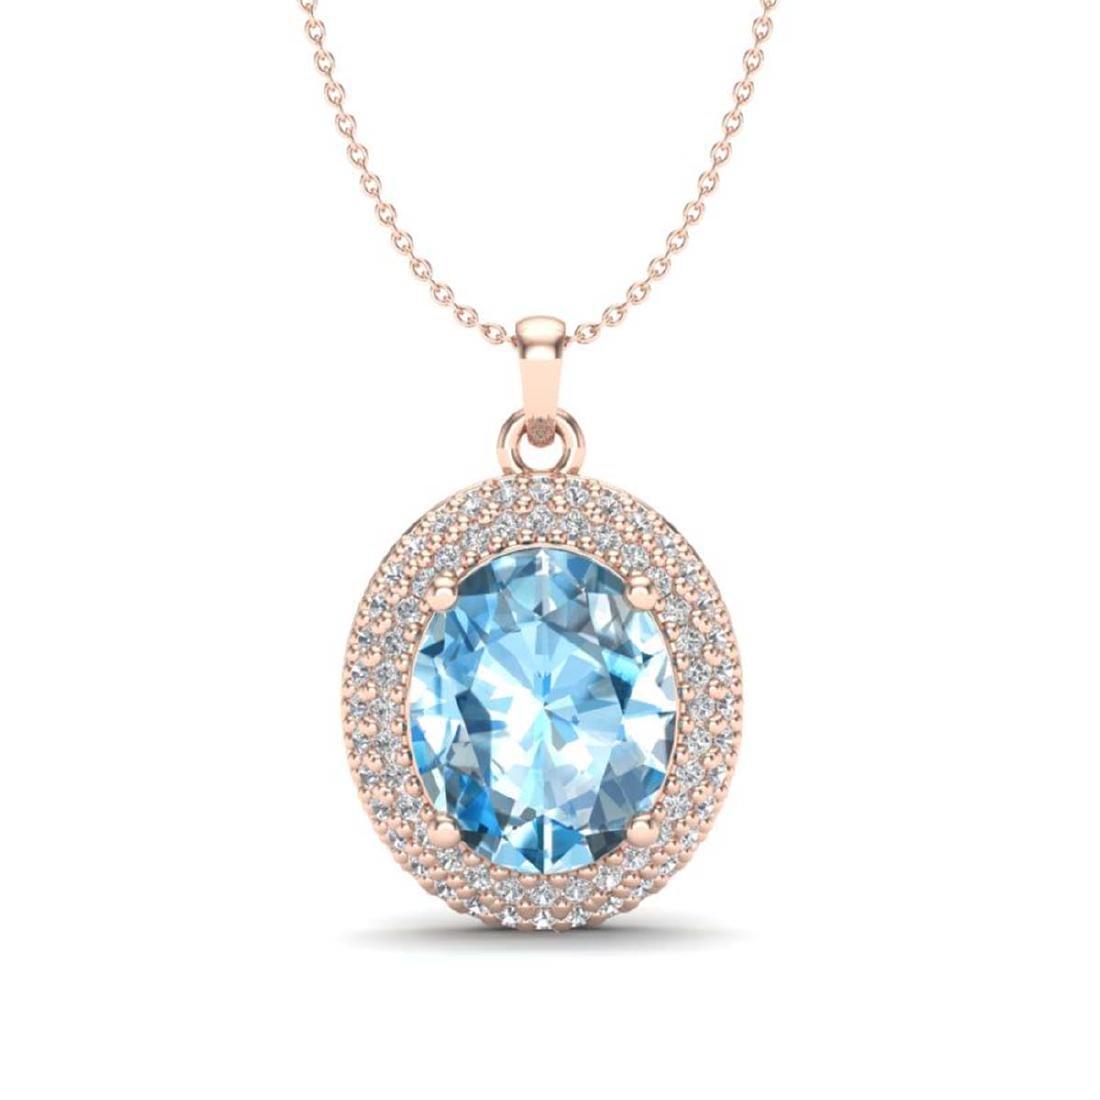 5 CTW Sky Blue Topaz & VS/SI Diamond Necklace 14K Gold